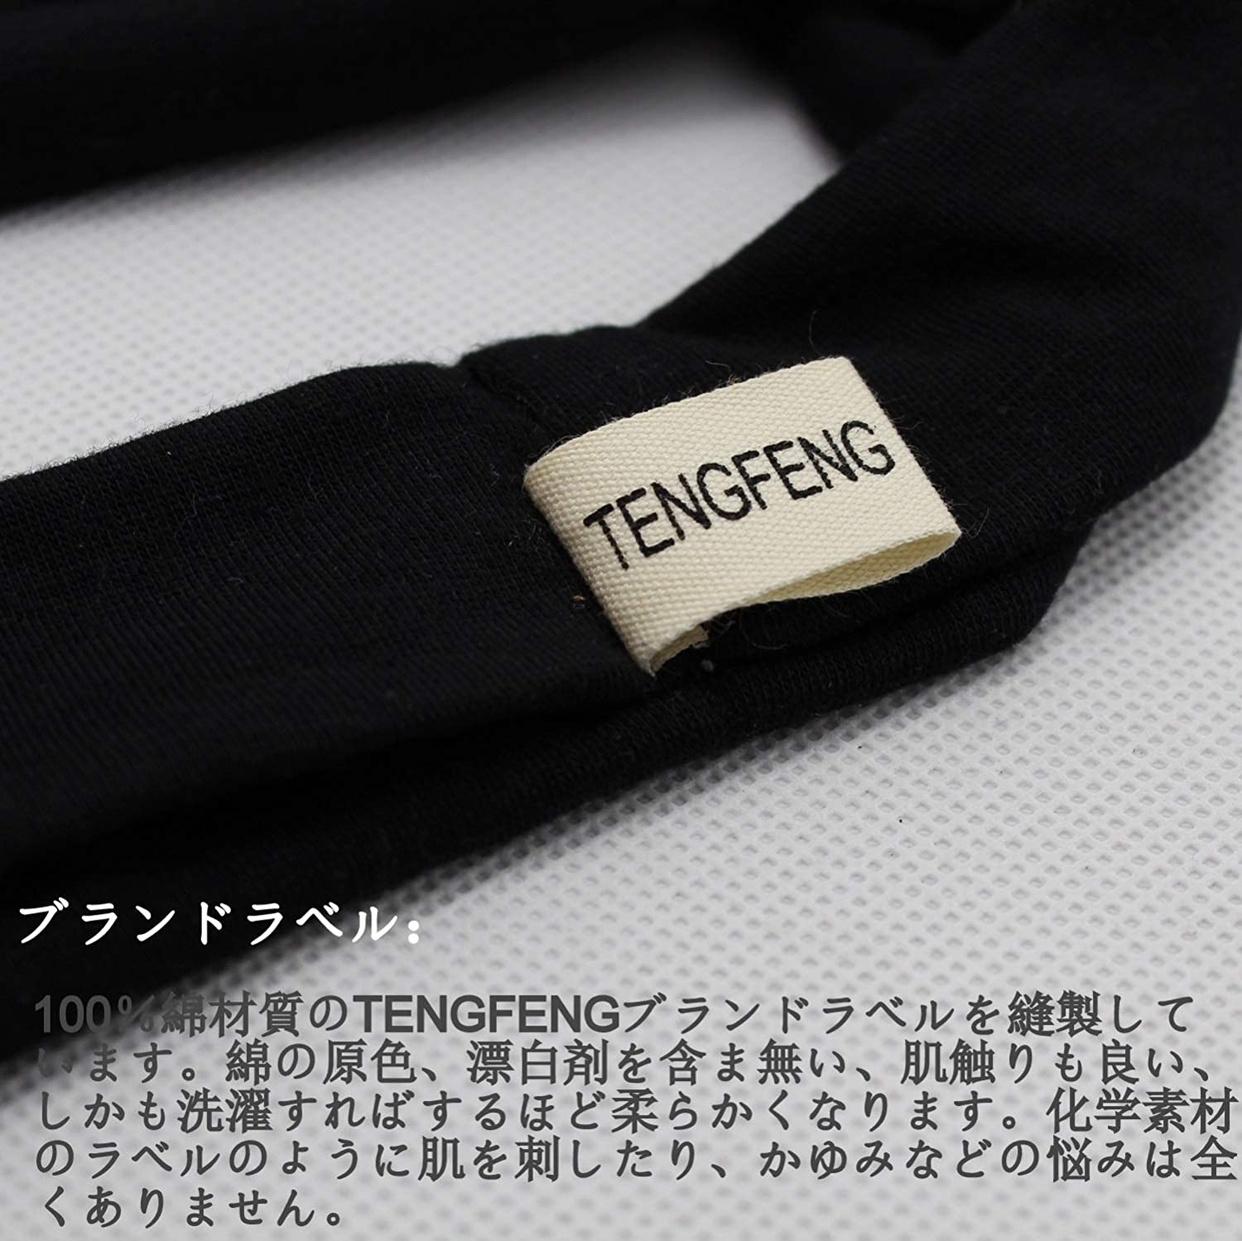 TENGFENG(テングフェング) 広幅 汗止めバンドの商品画像5